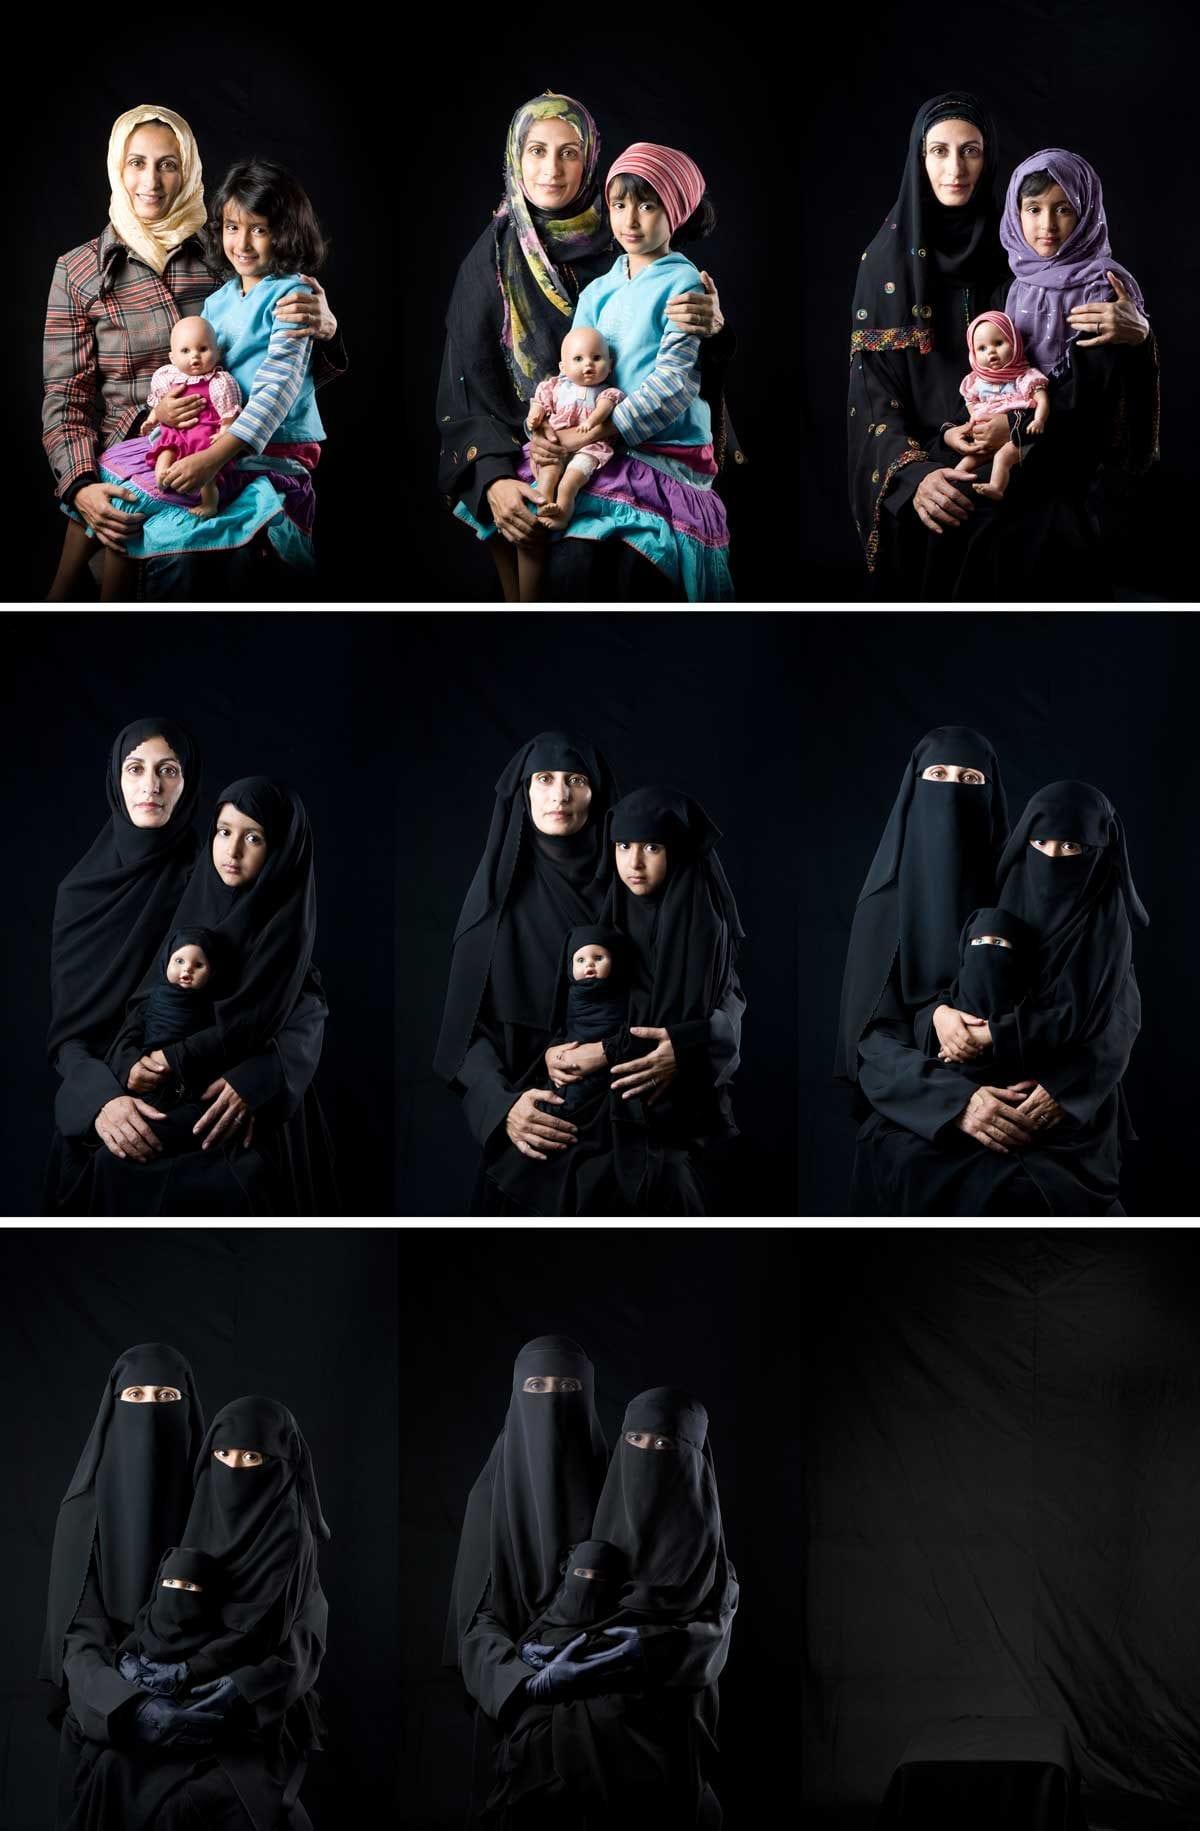 La mère, la fille et la poupée © Boushra Almutawakel